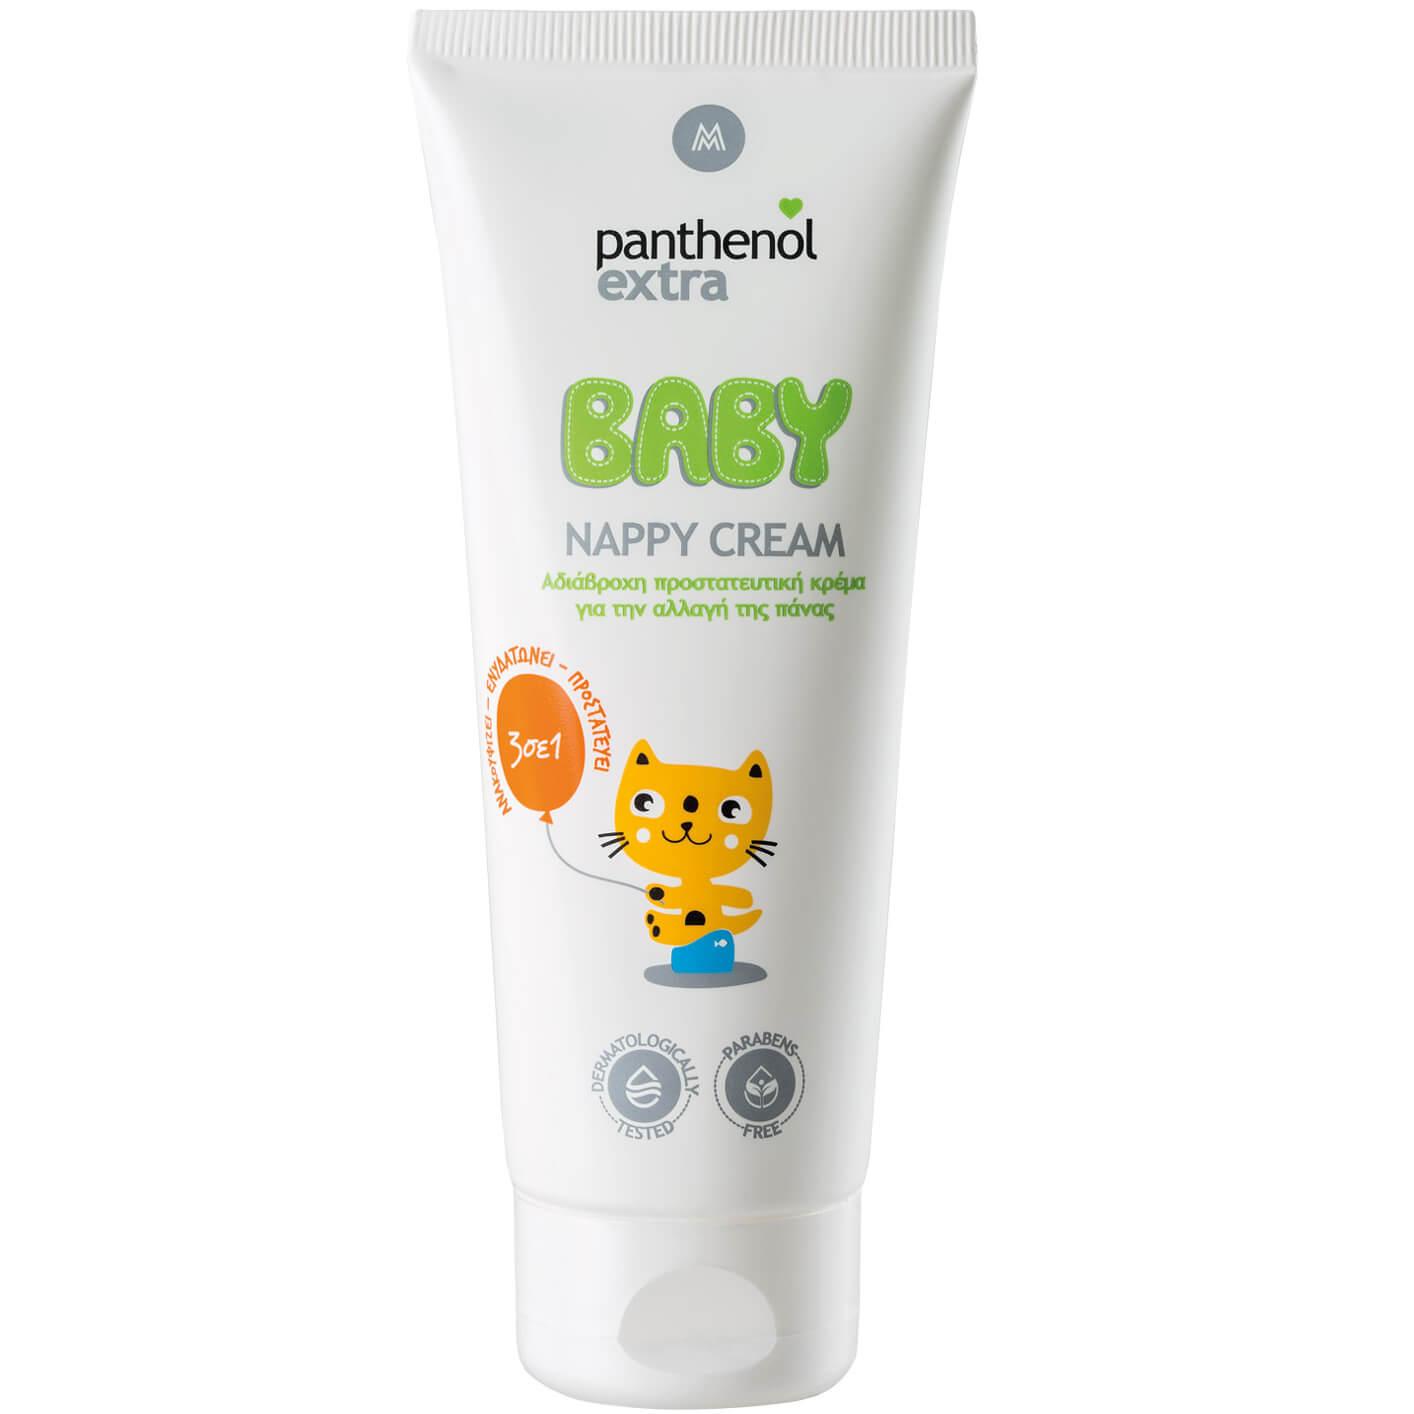 Panthenol Extra Baby Nappy Cream Προστατευτική Κρέμα για την Αλλαγή της Πάνας 100ml